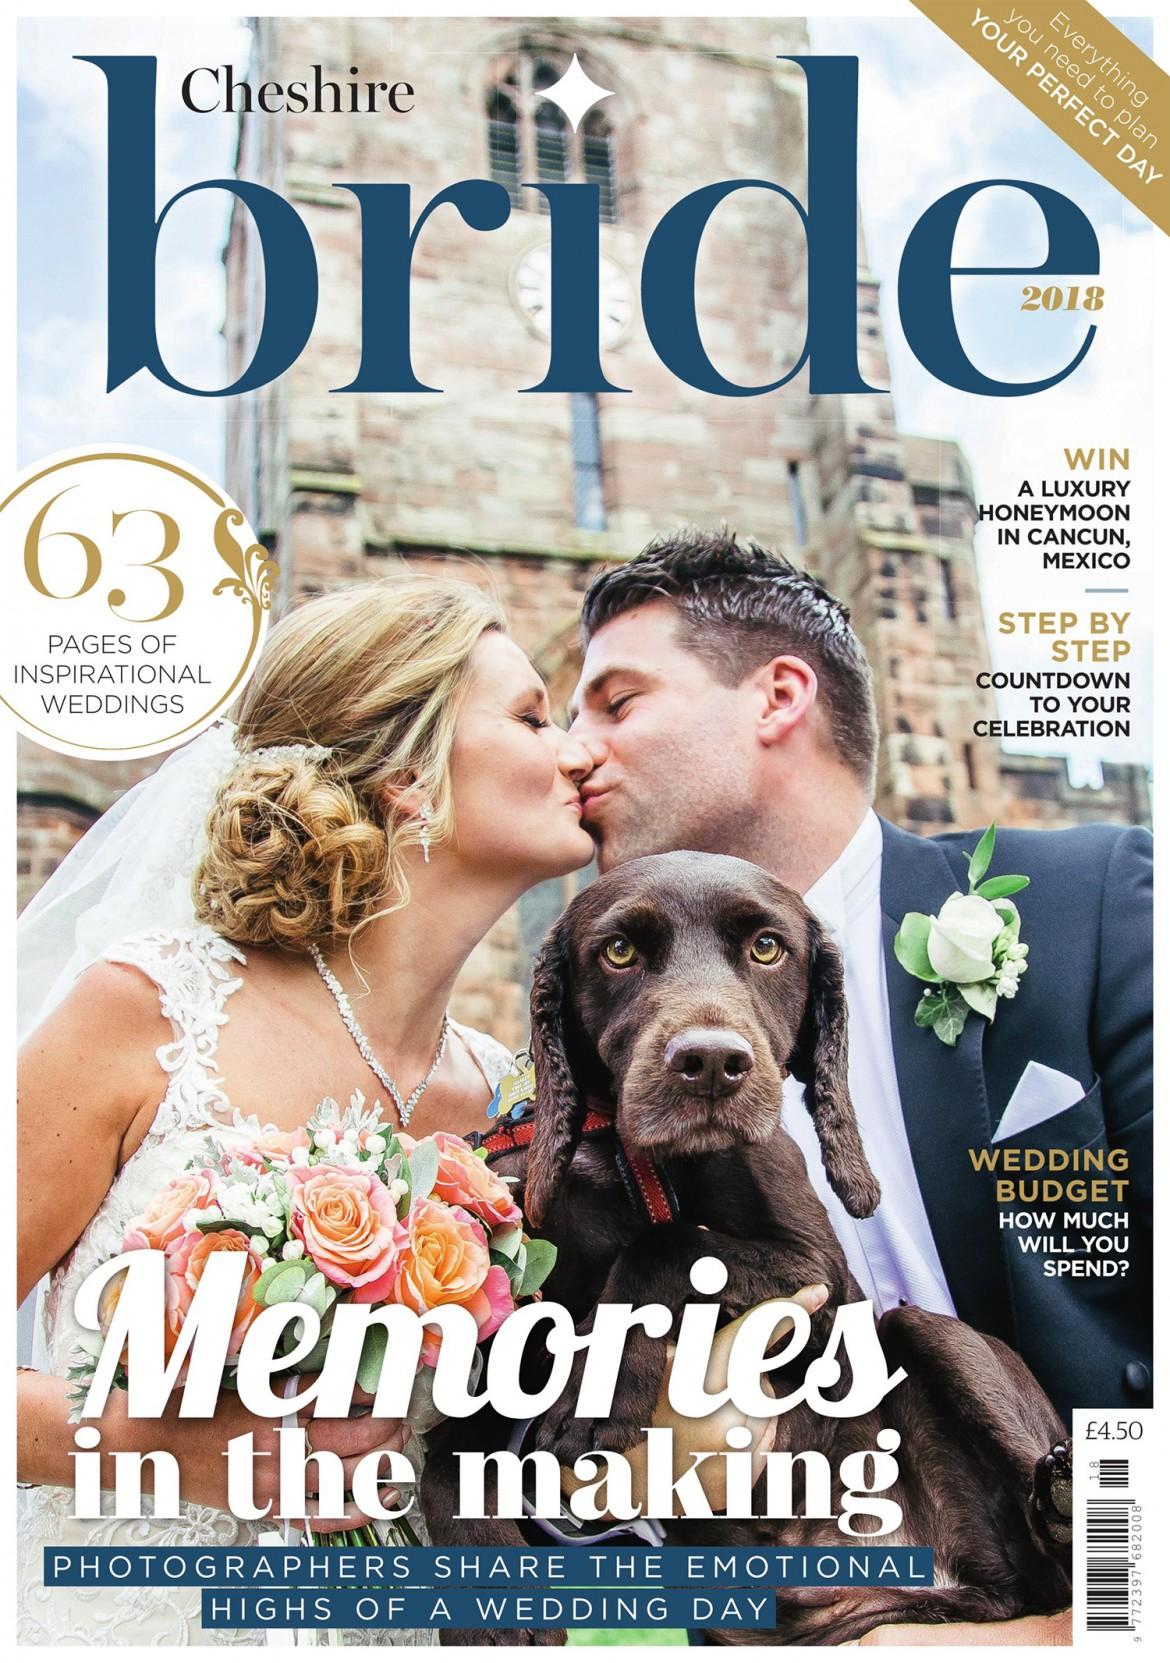 Cheshire Bride Magazine designer wedding dress by Caroline Castigliano